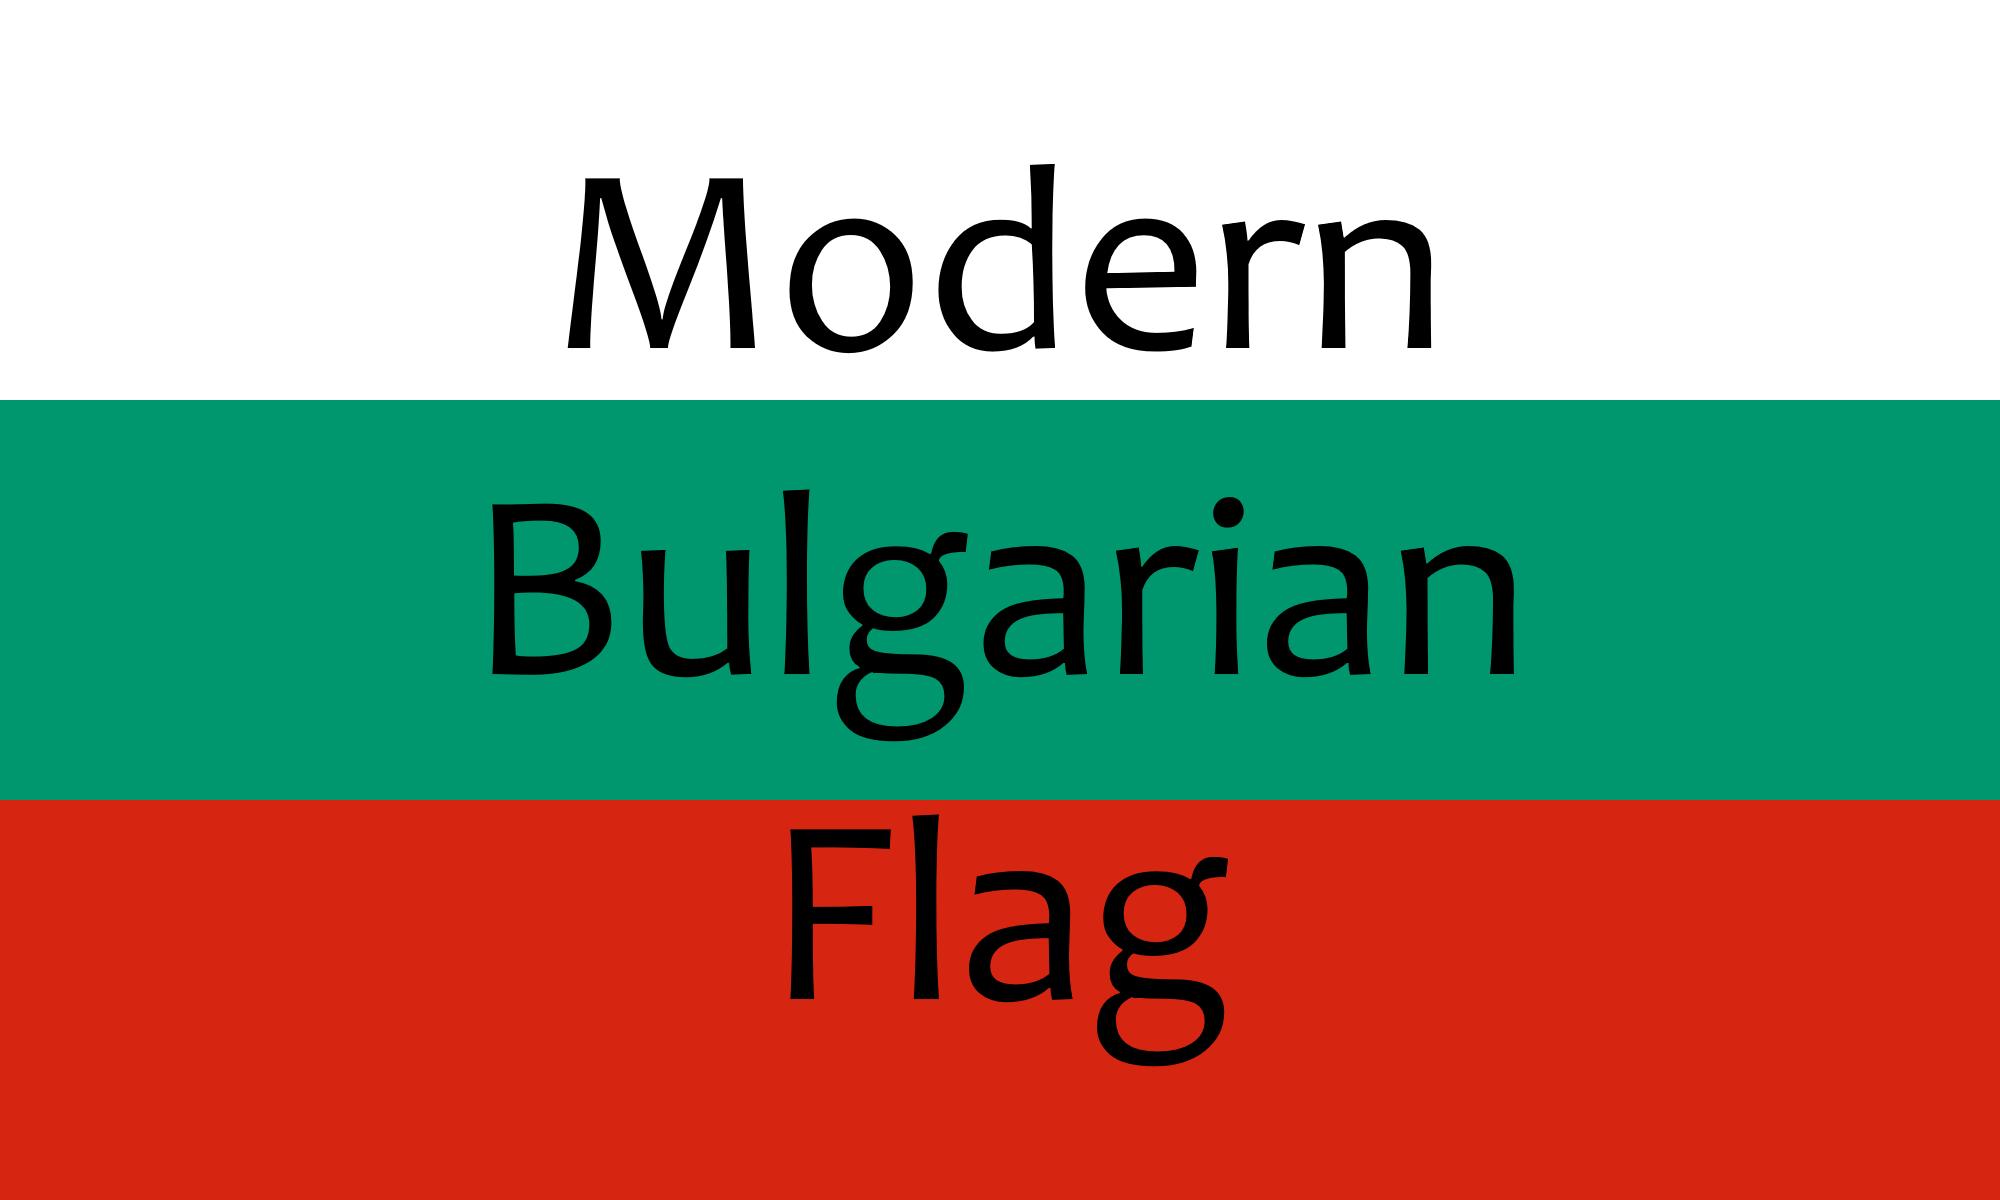 Modern Bulgaria